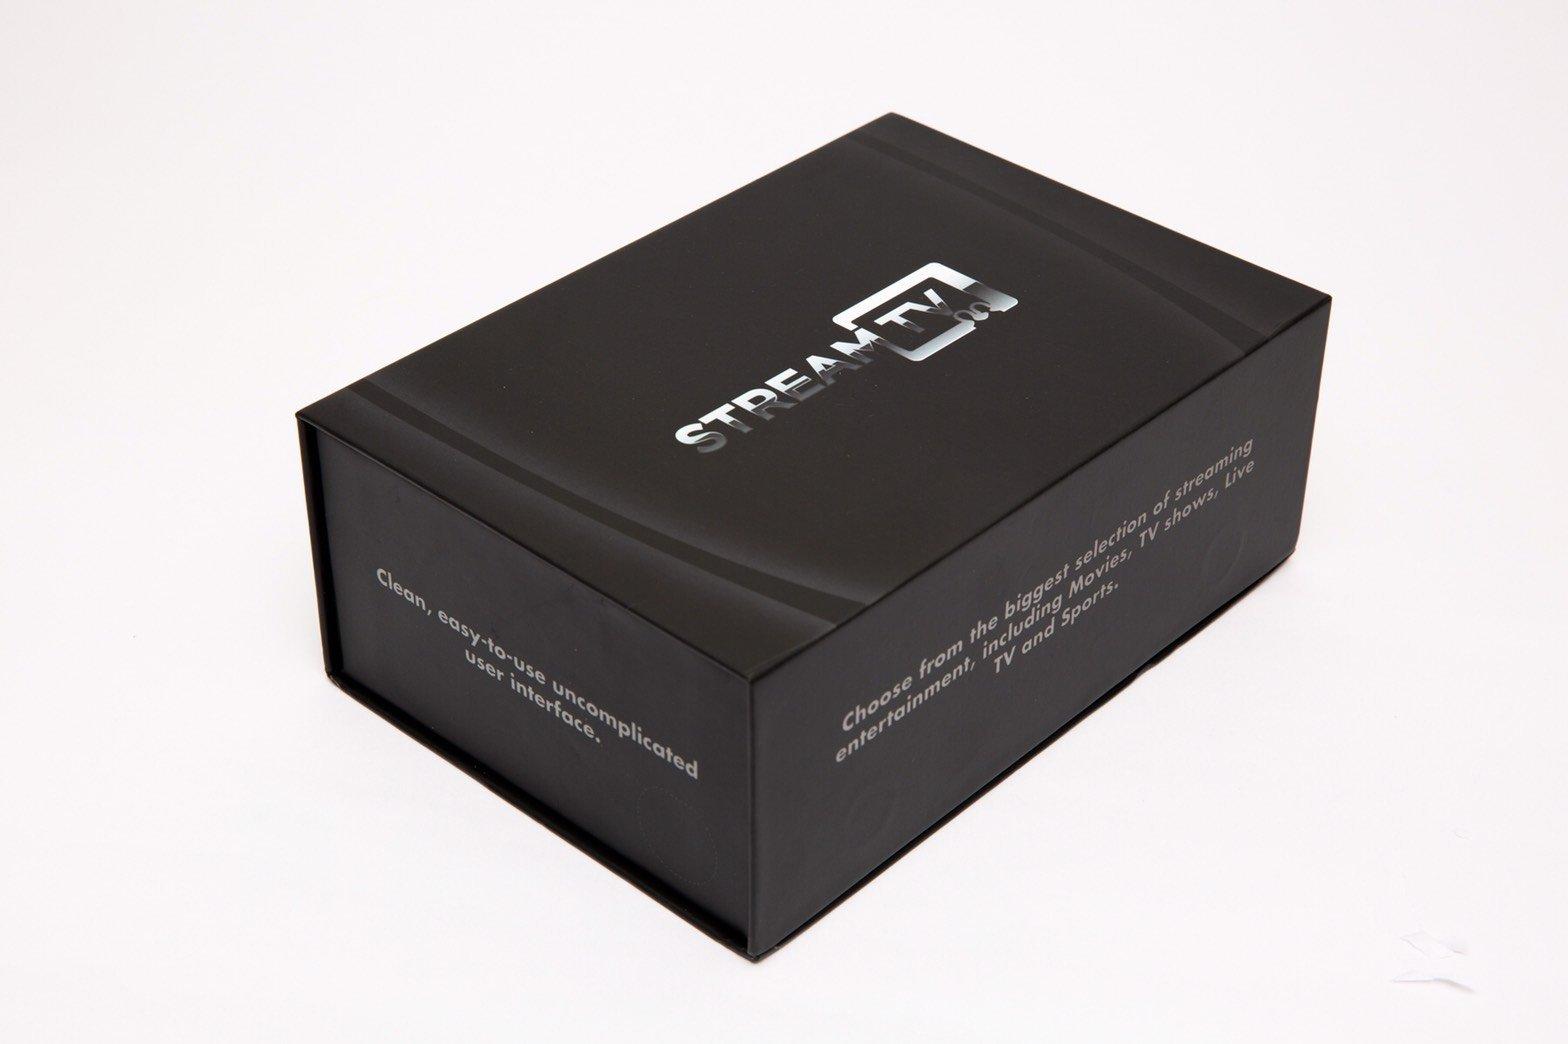 StreamTV Box $265.00 Stream TV The StreamTV Media Streaming ...